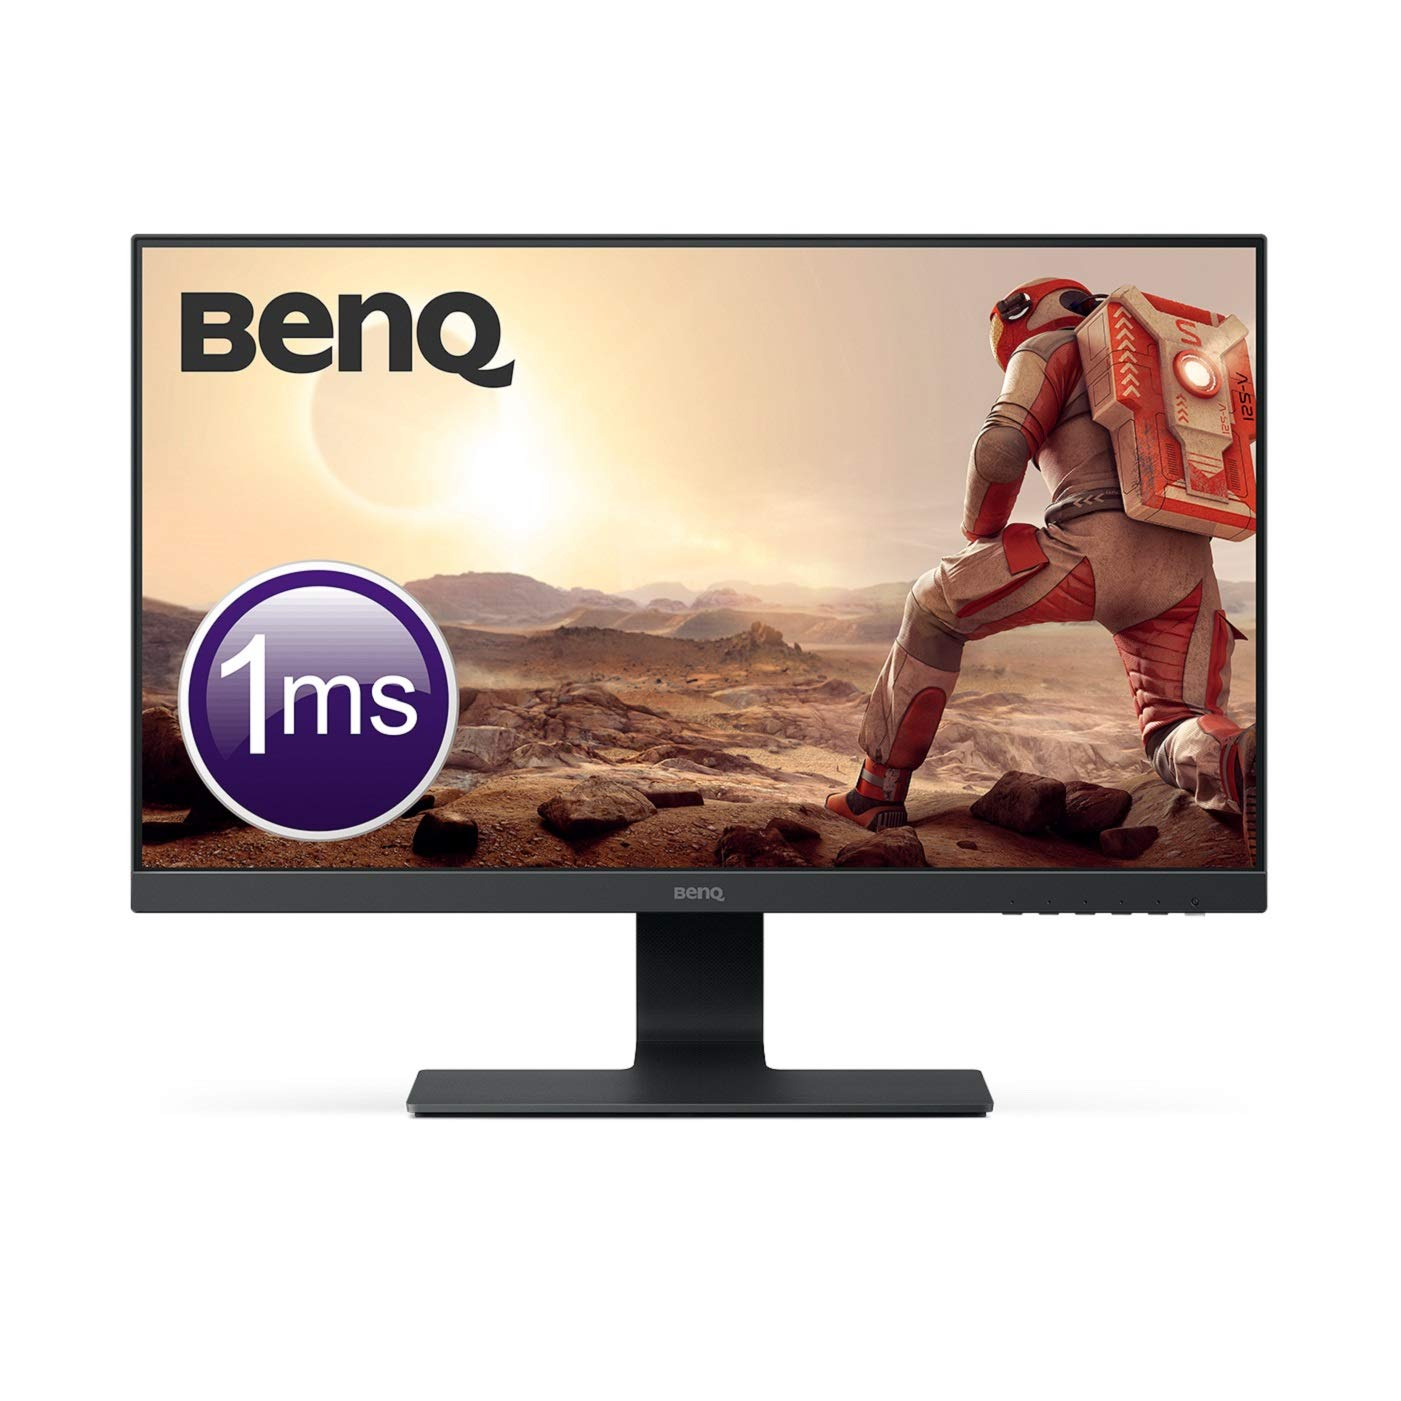 BenQ LED GL2580HM 24.5